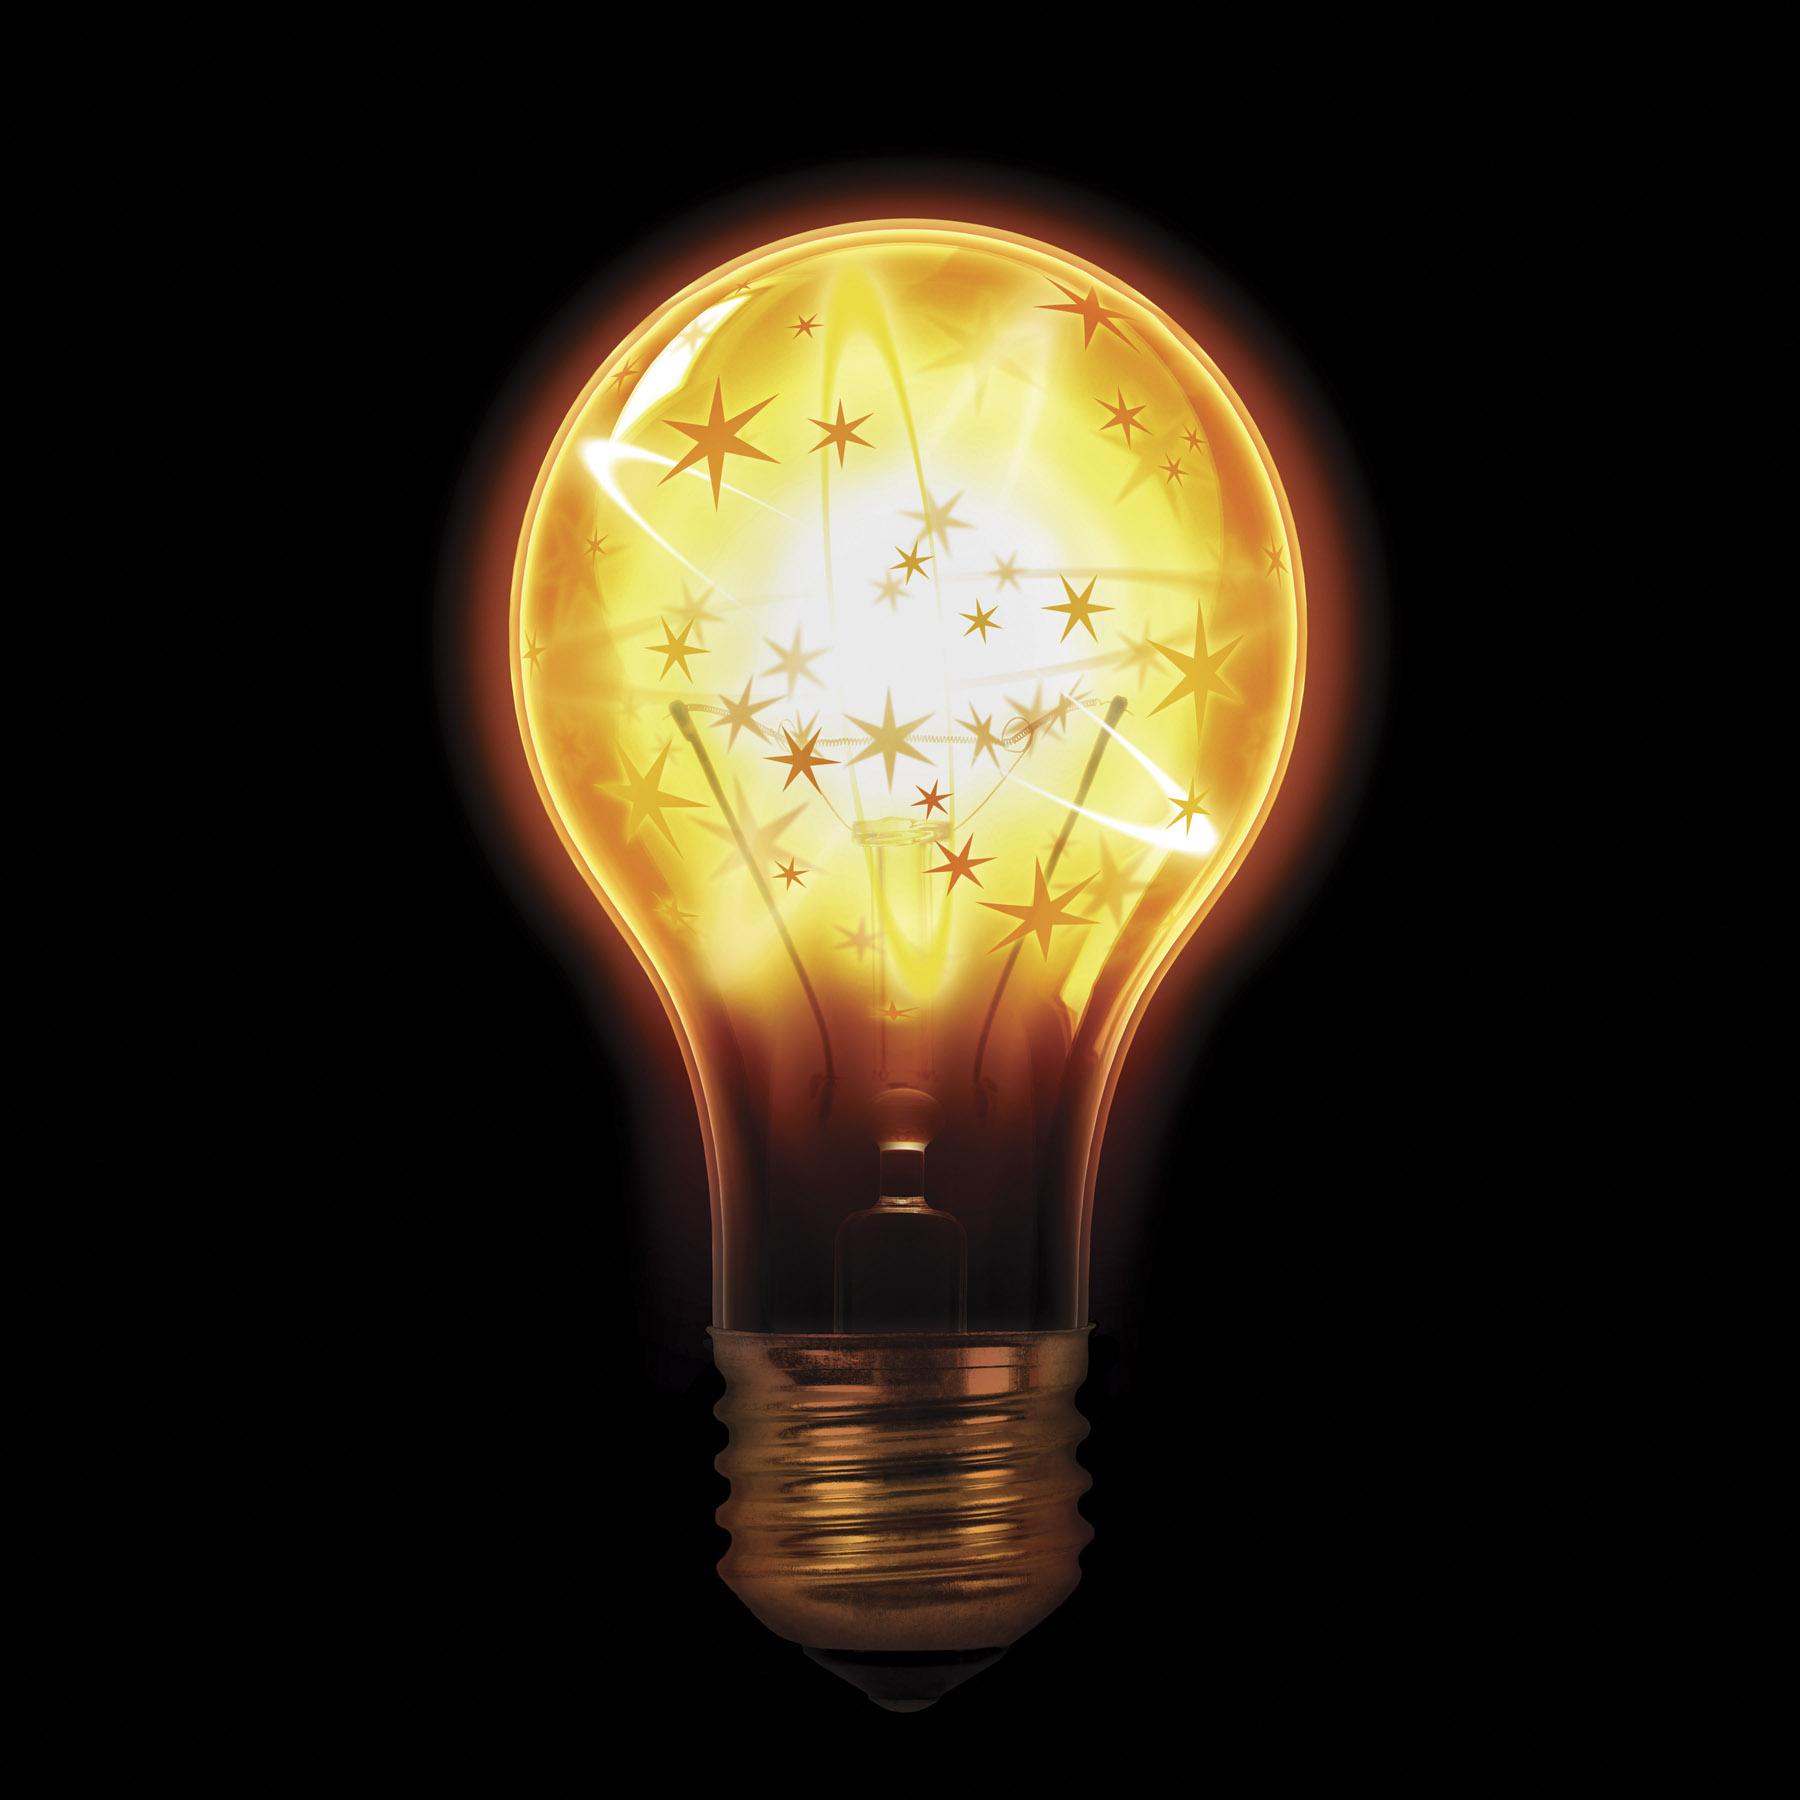 Congratulations to a UON Bright Spark, University of Newcastle